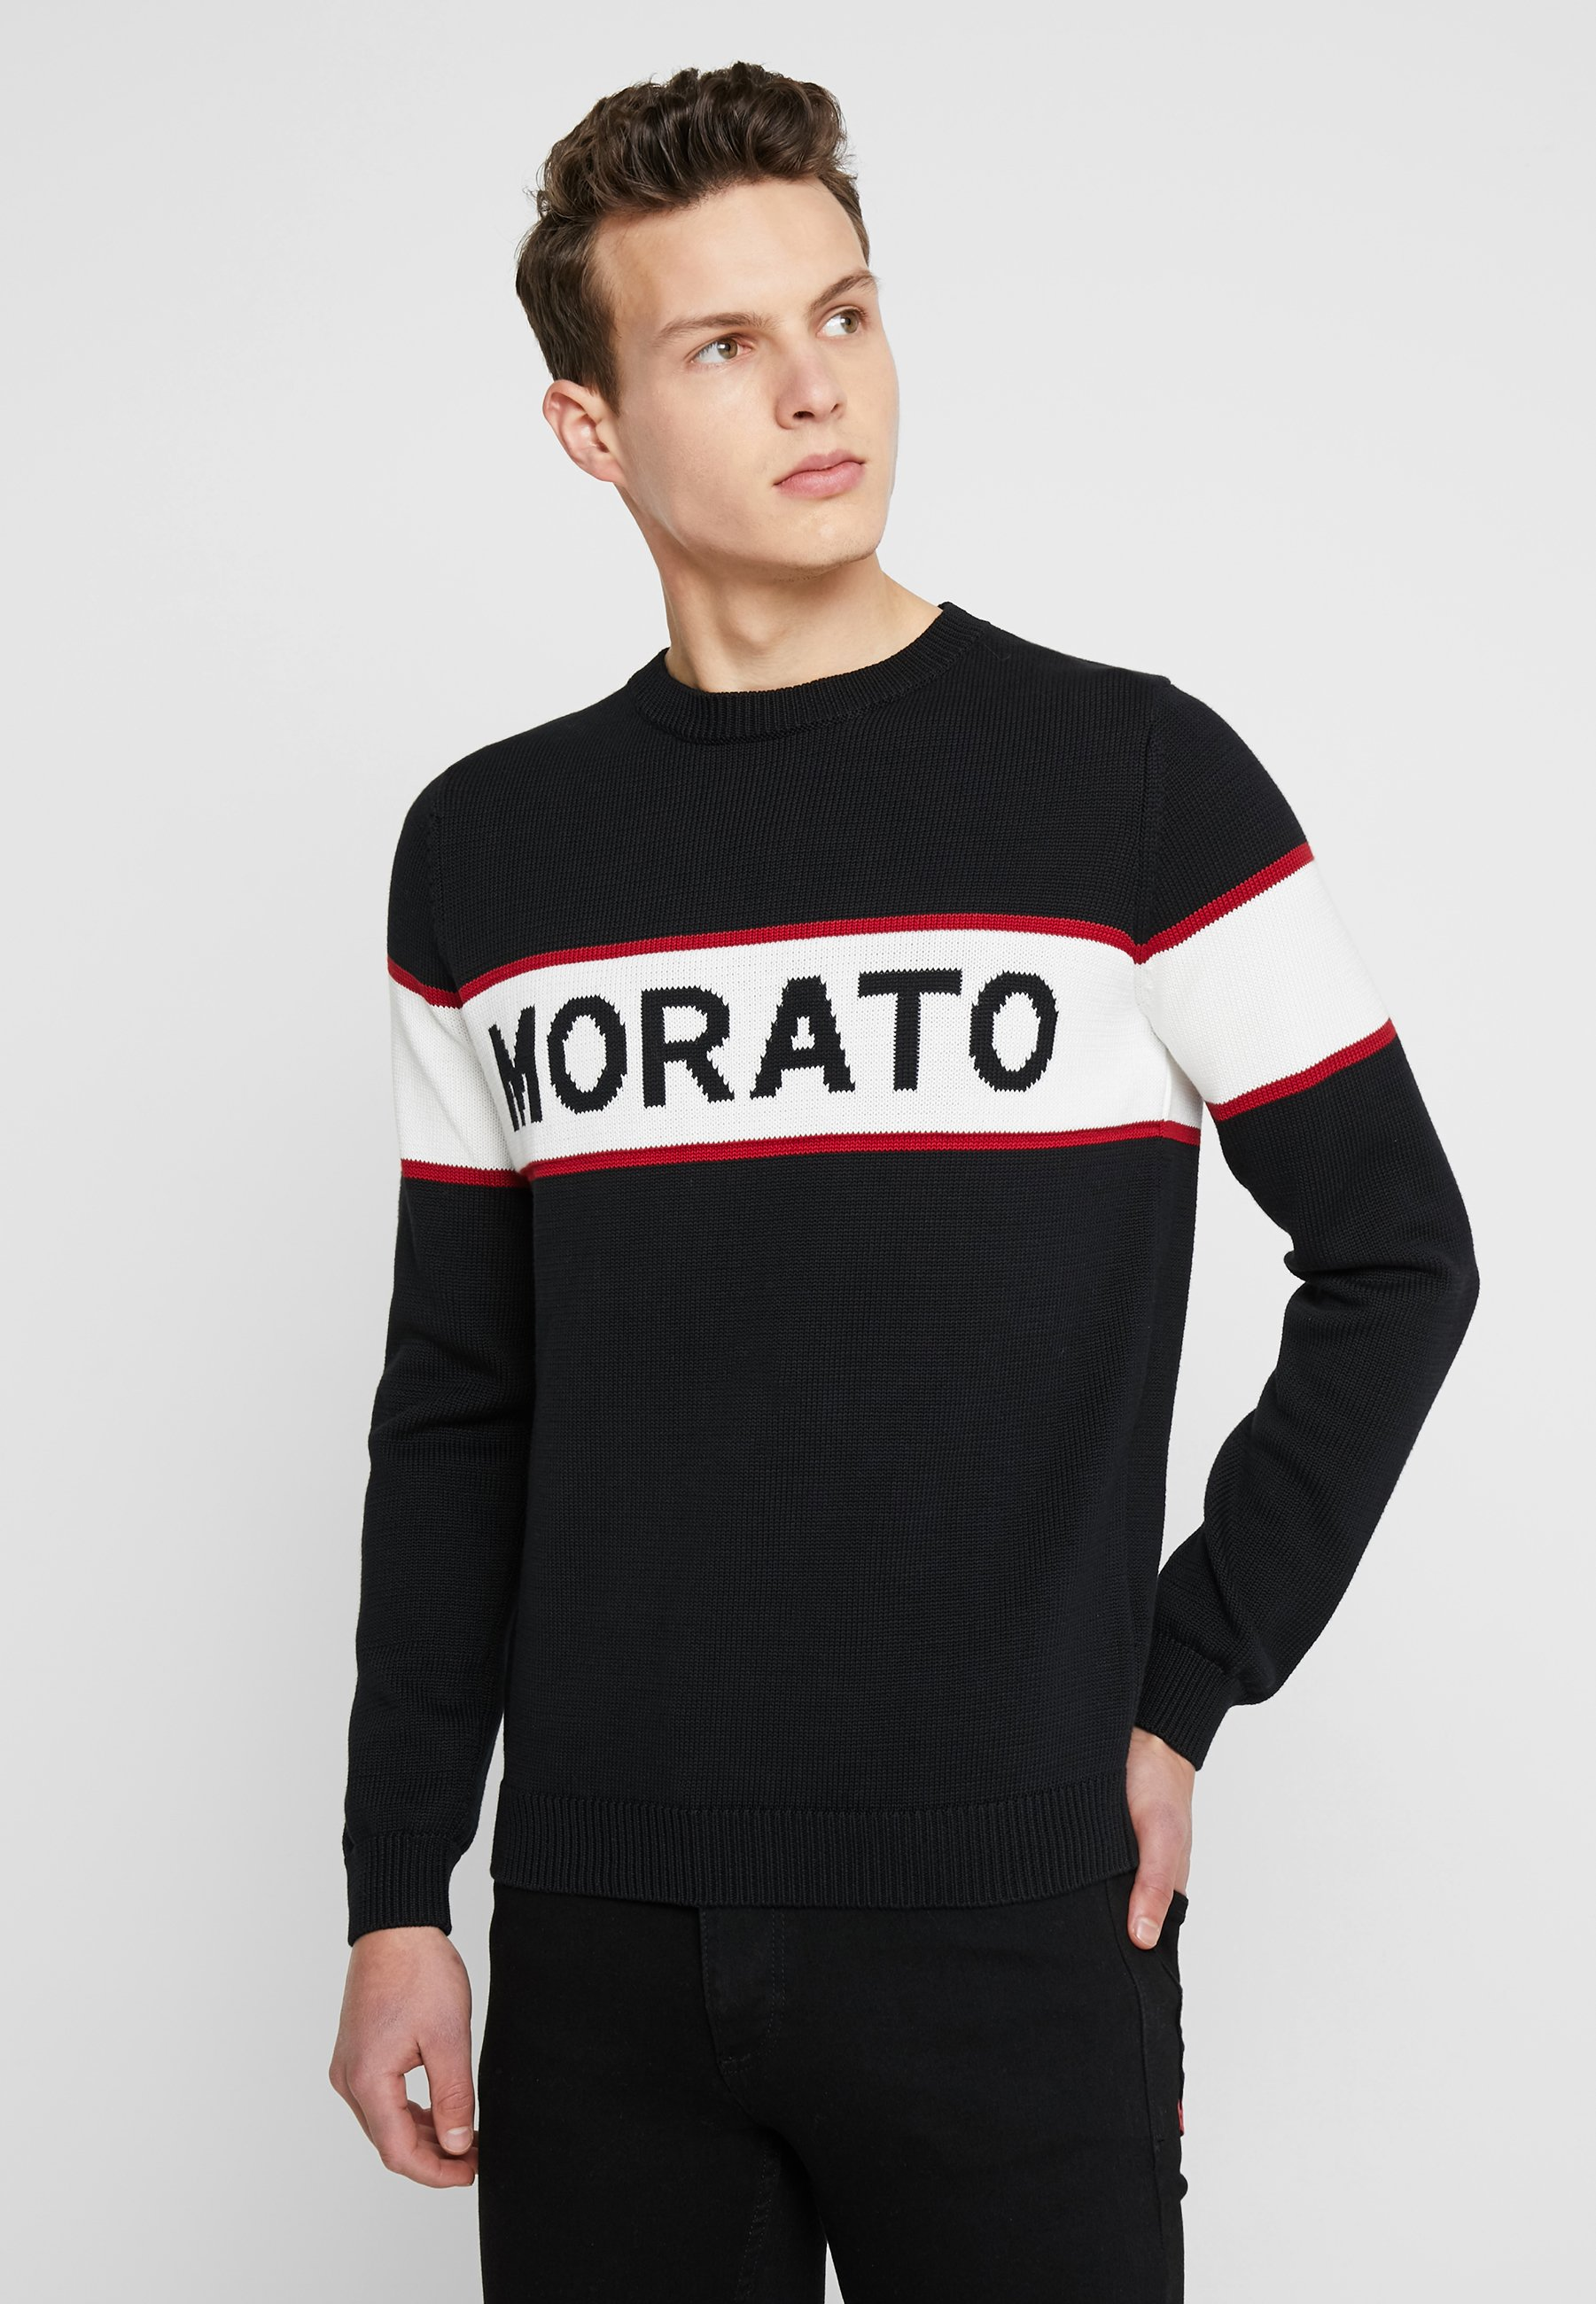 FrontPullover Round Collar With Antony Morato Black kXZTwOPiu